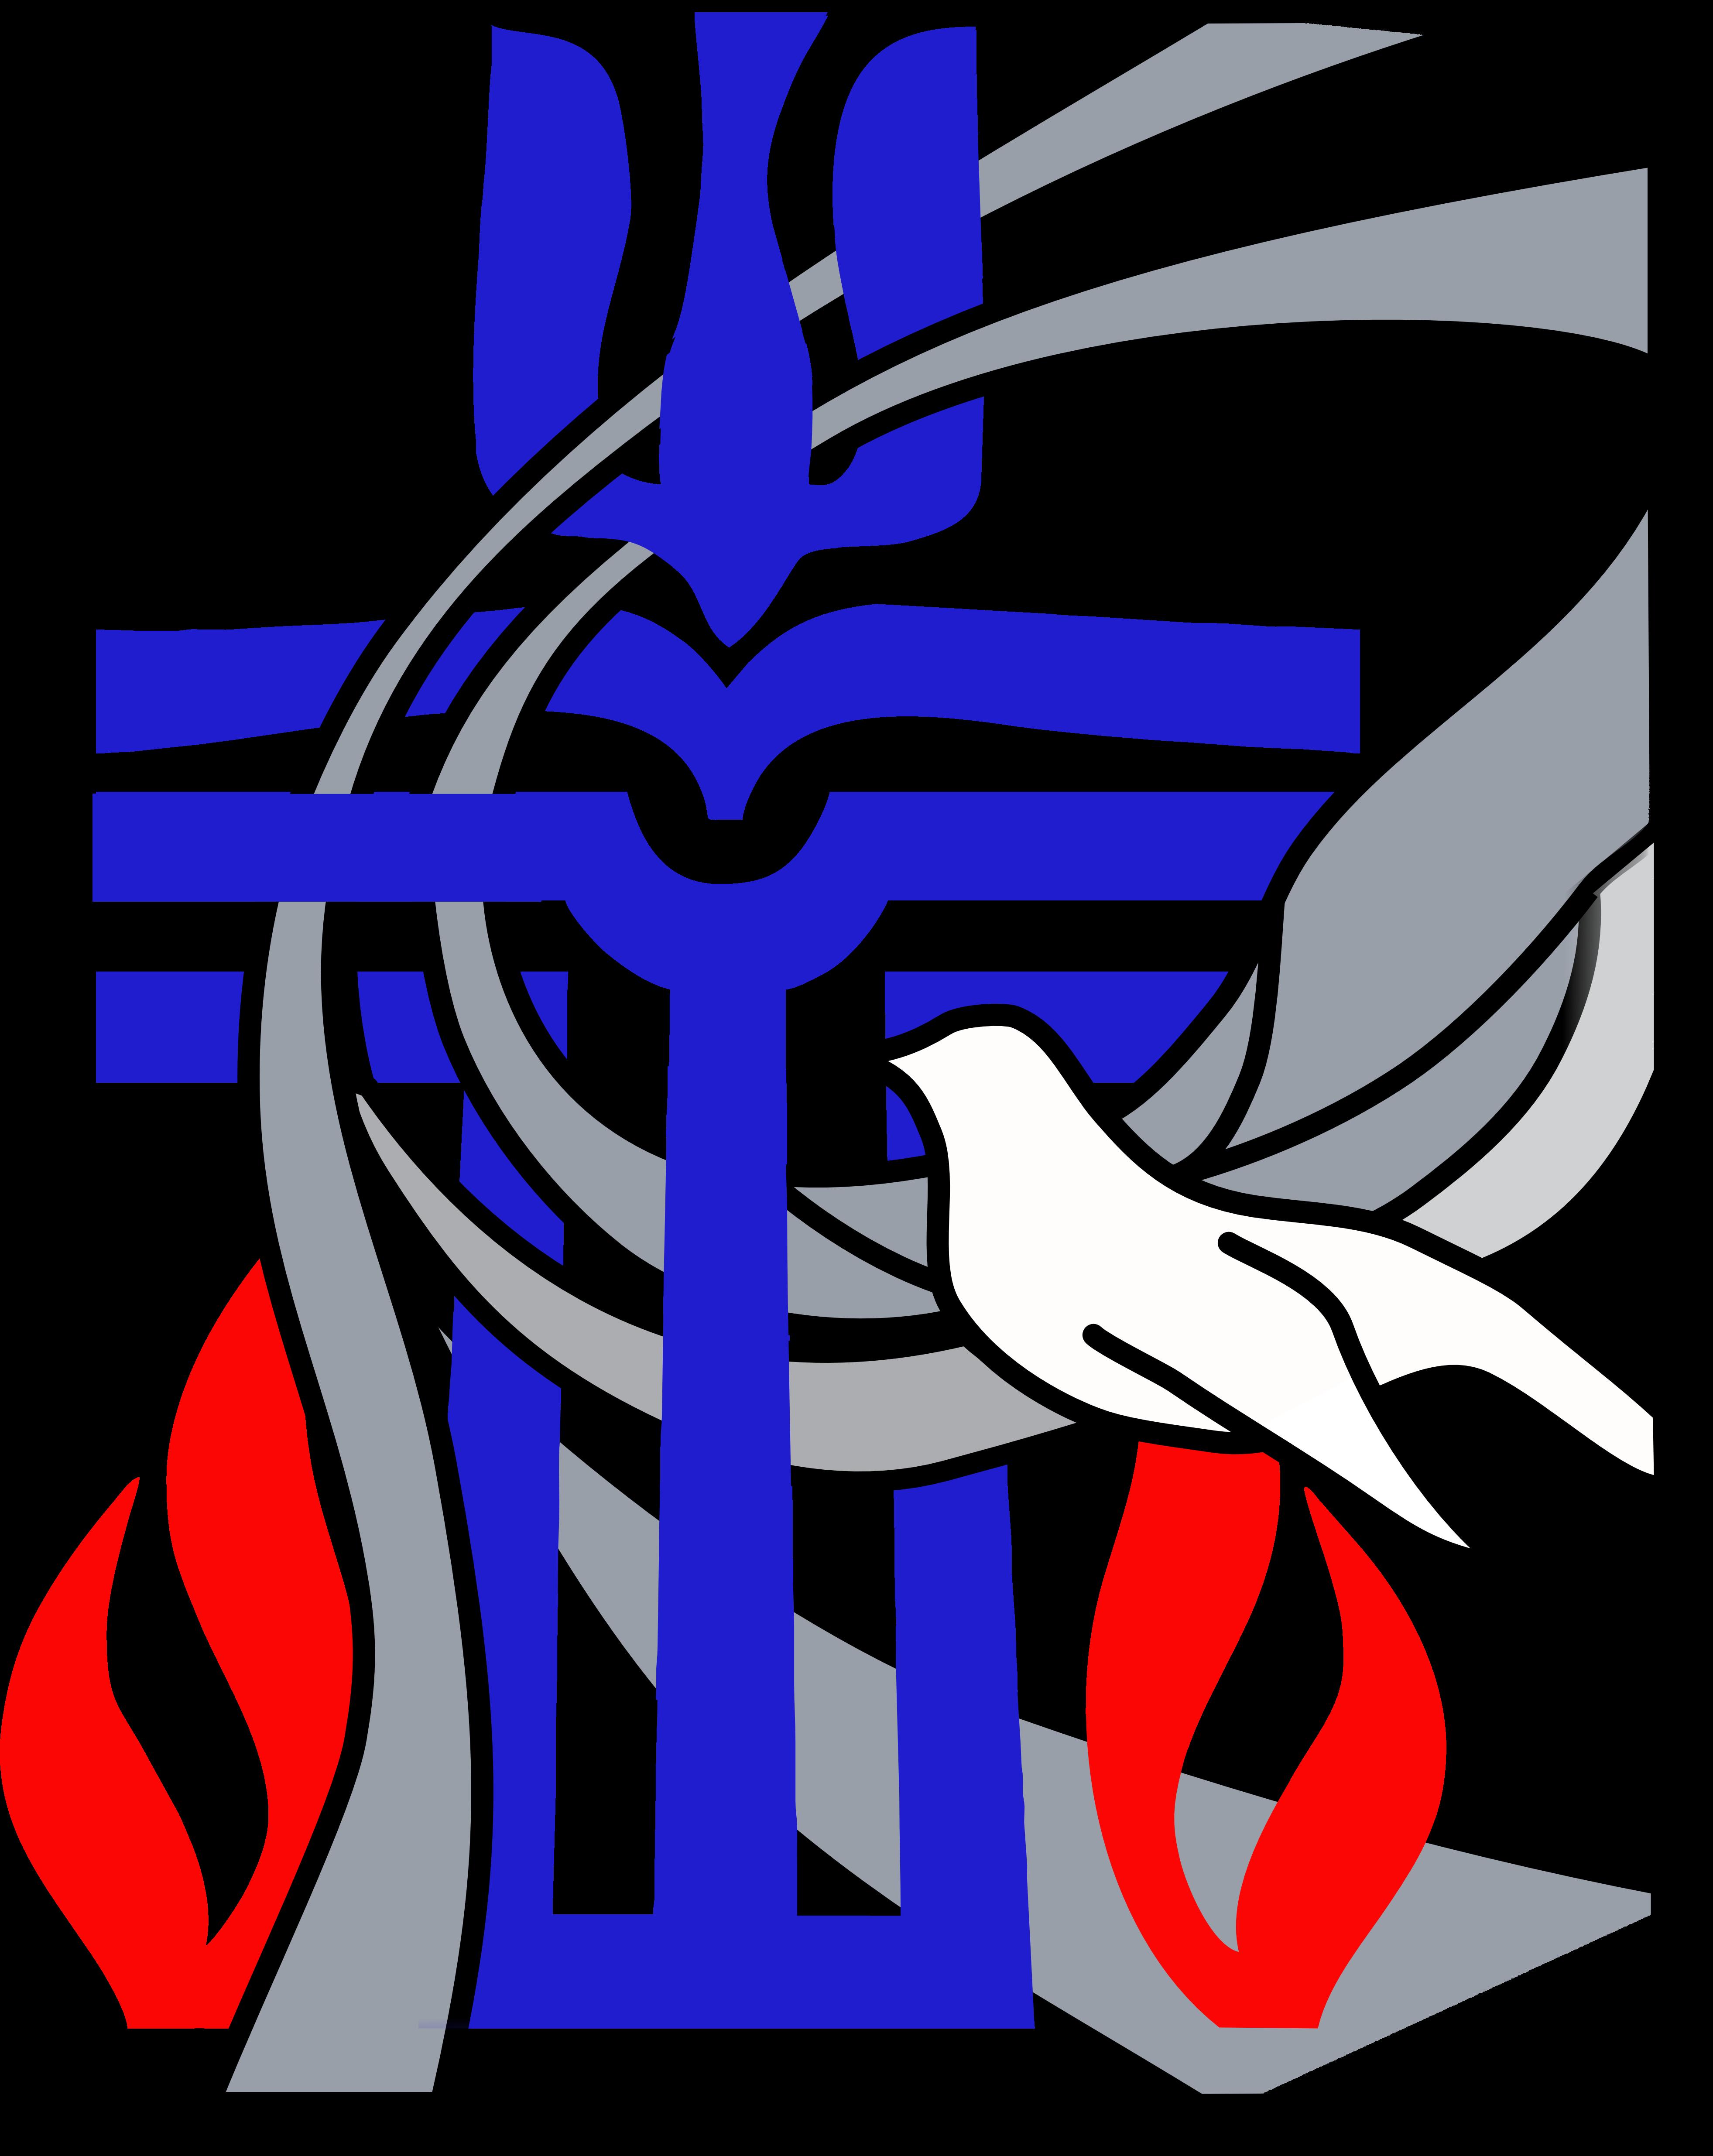 Donation clipart church membership. Worship rio rancho presbyterian